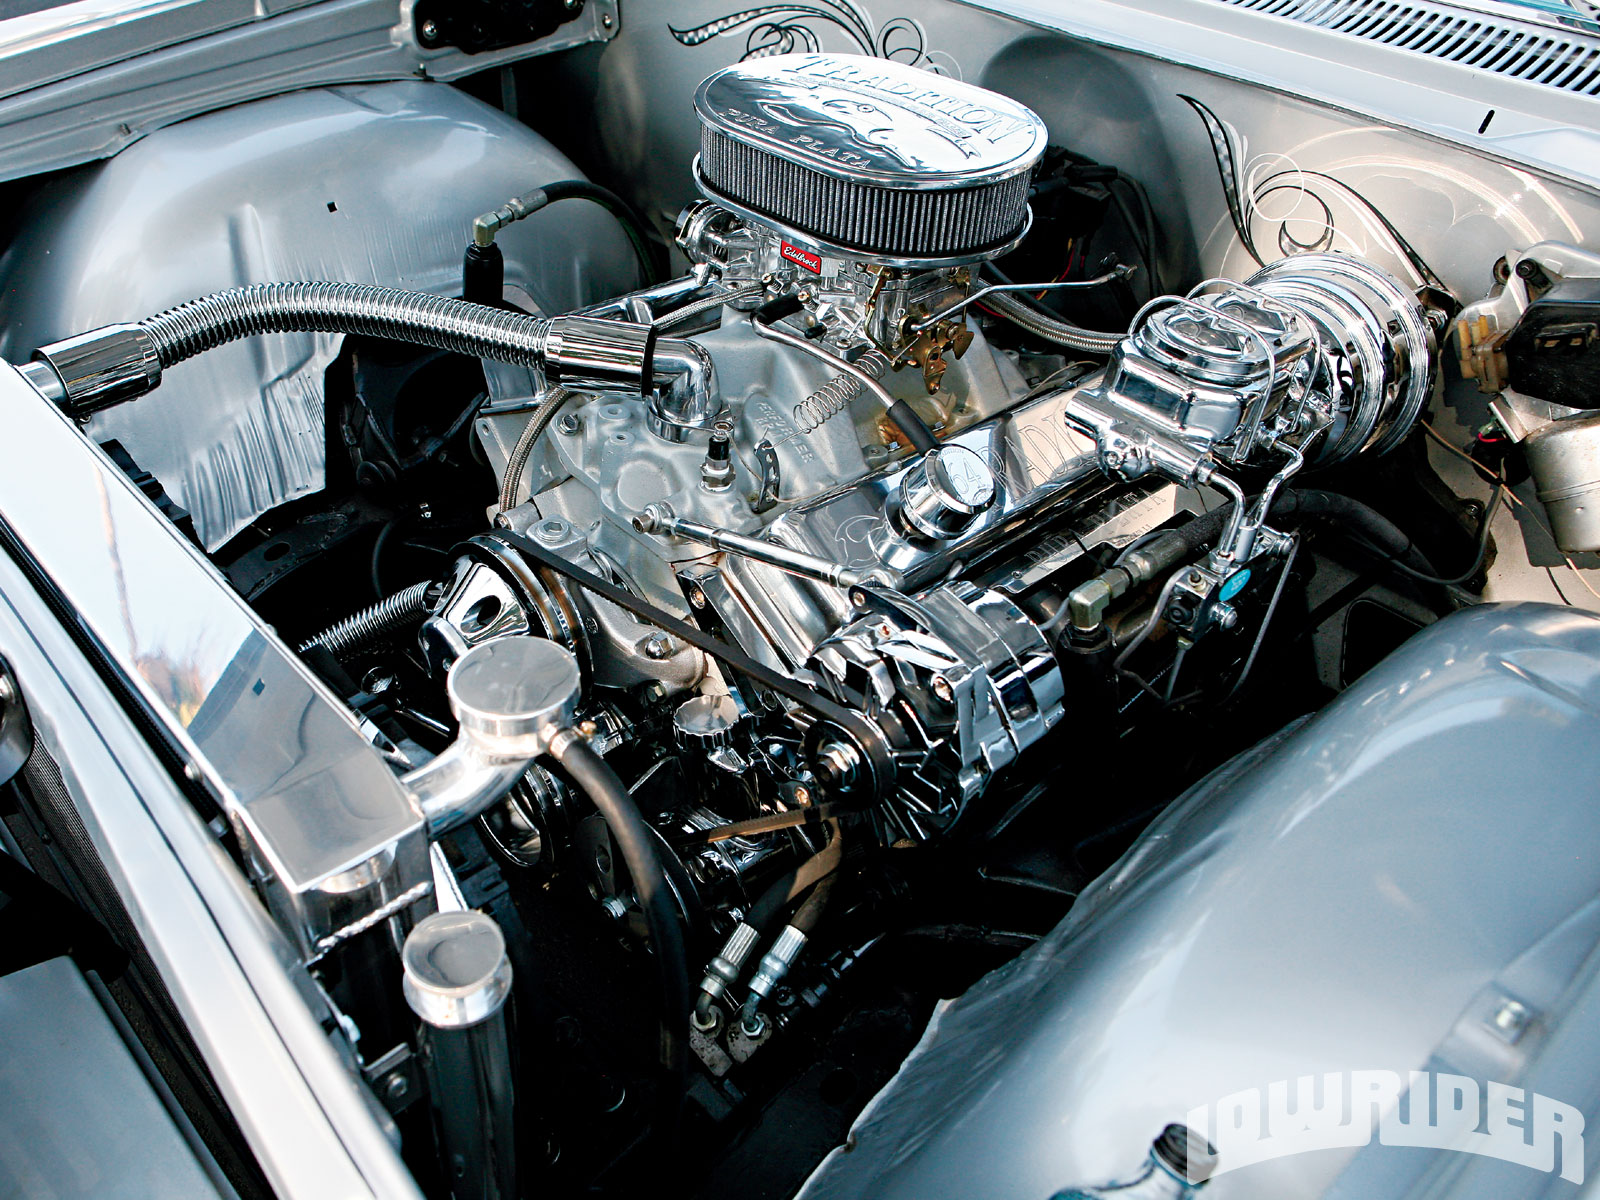 1964 Chevrolet Impala Wagon - Rebuilt 380 Engine - Lowrider Magazine